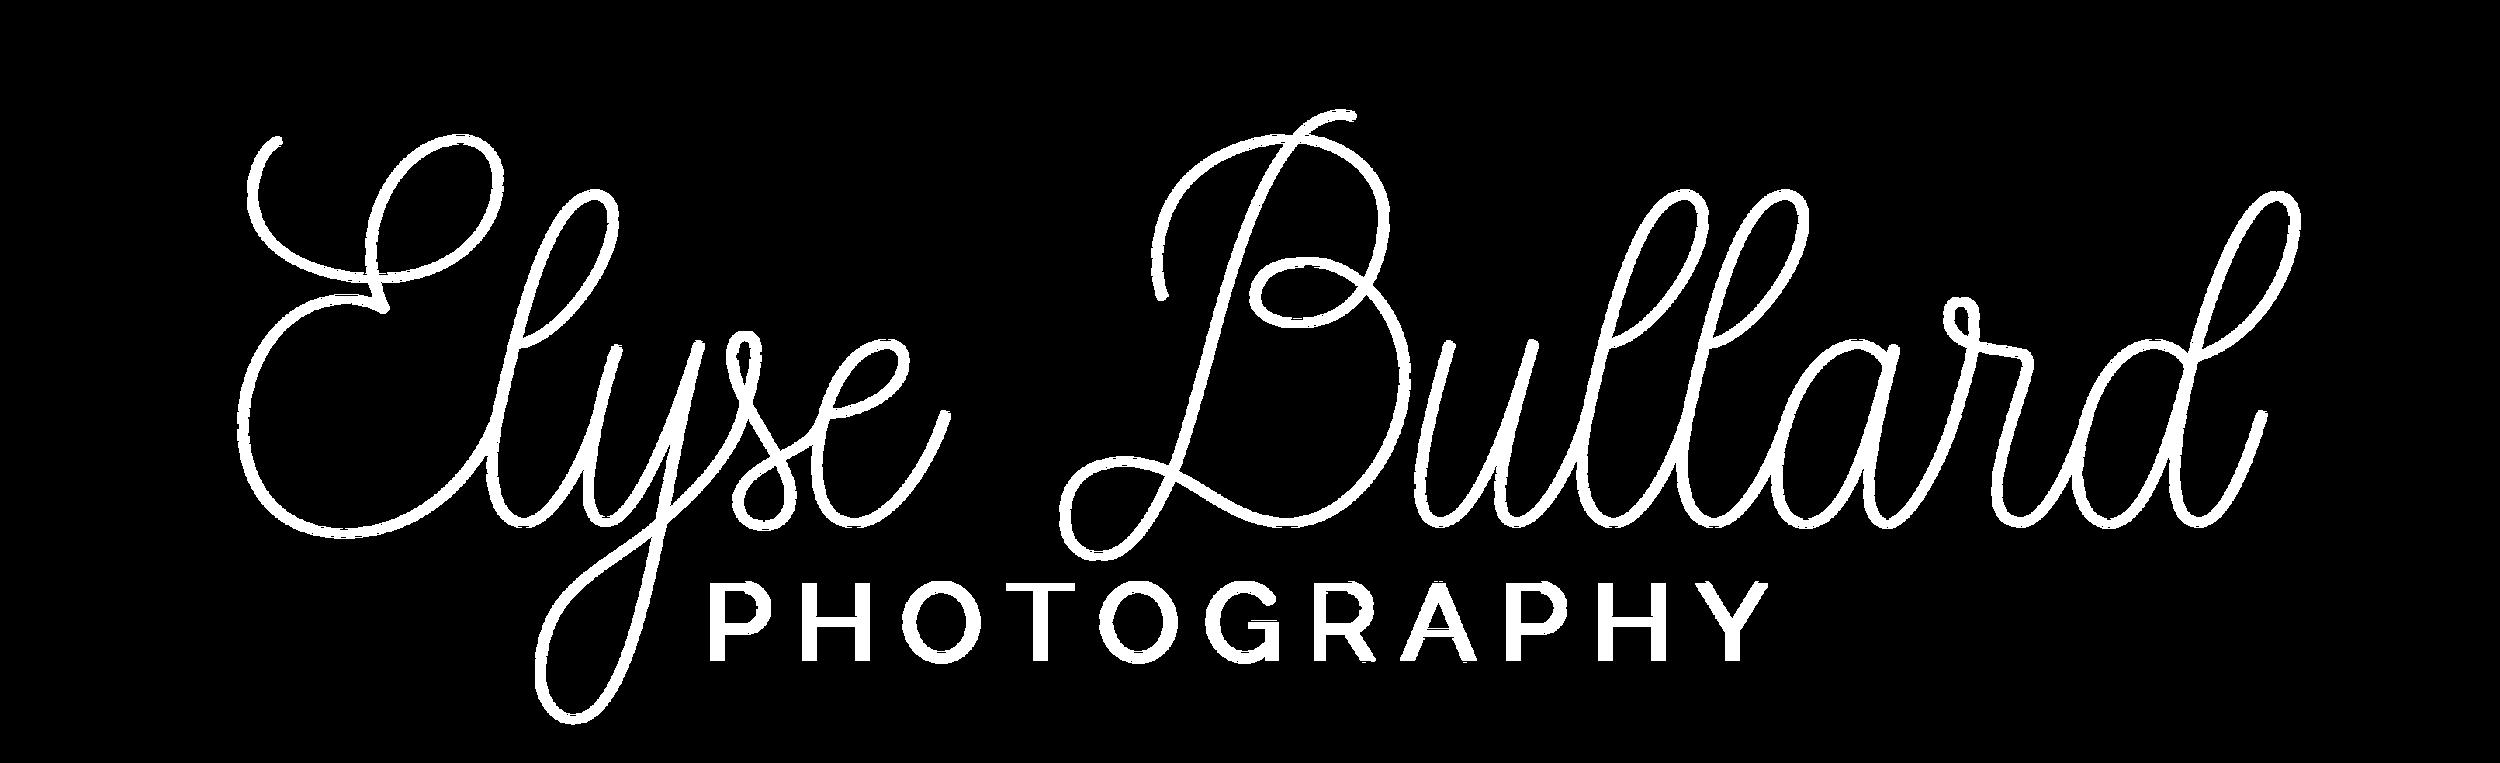 Elyse Bullard Photography